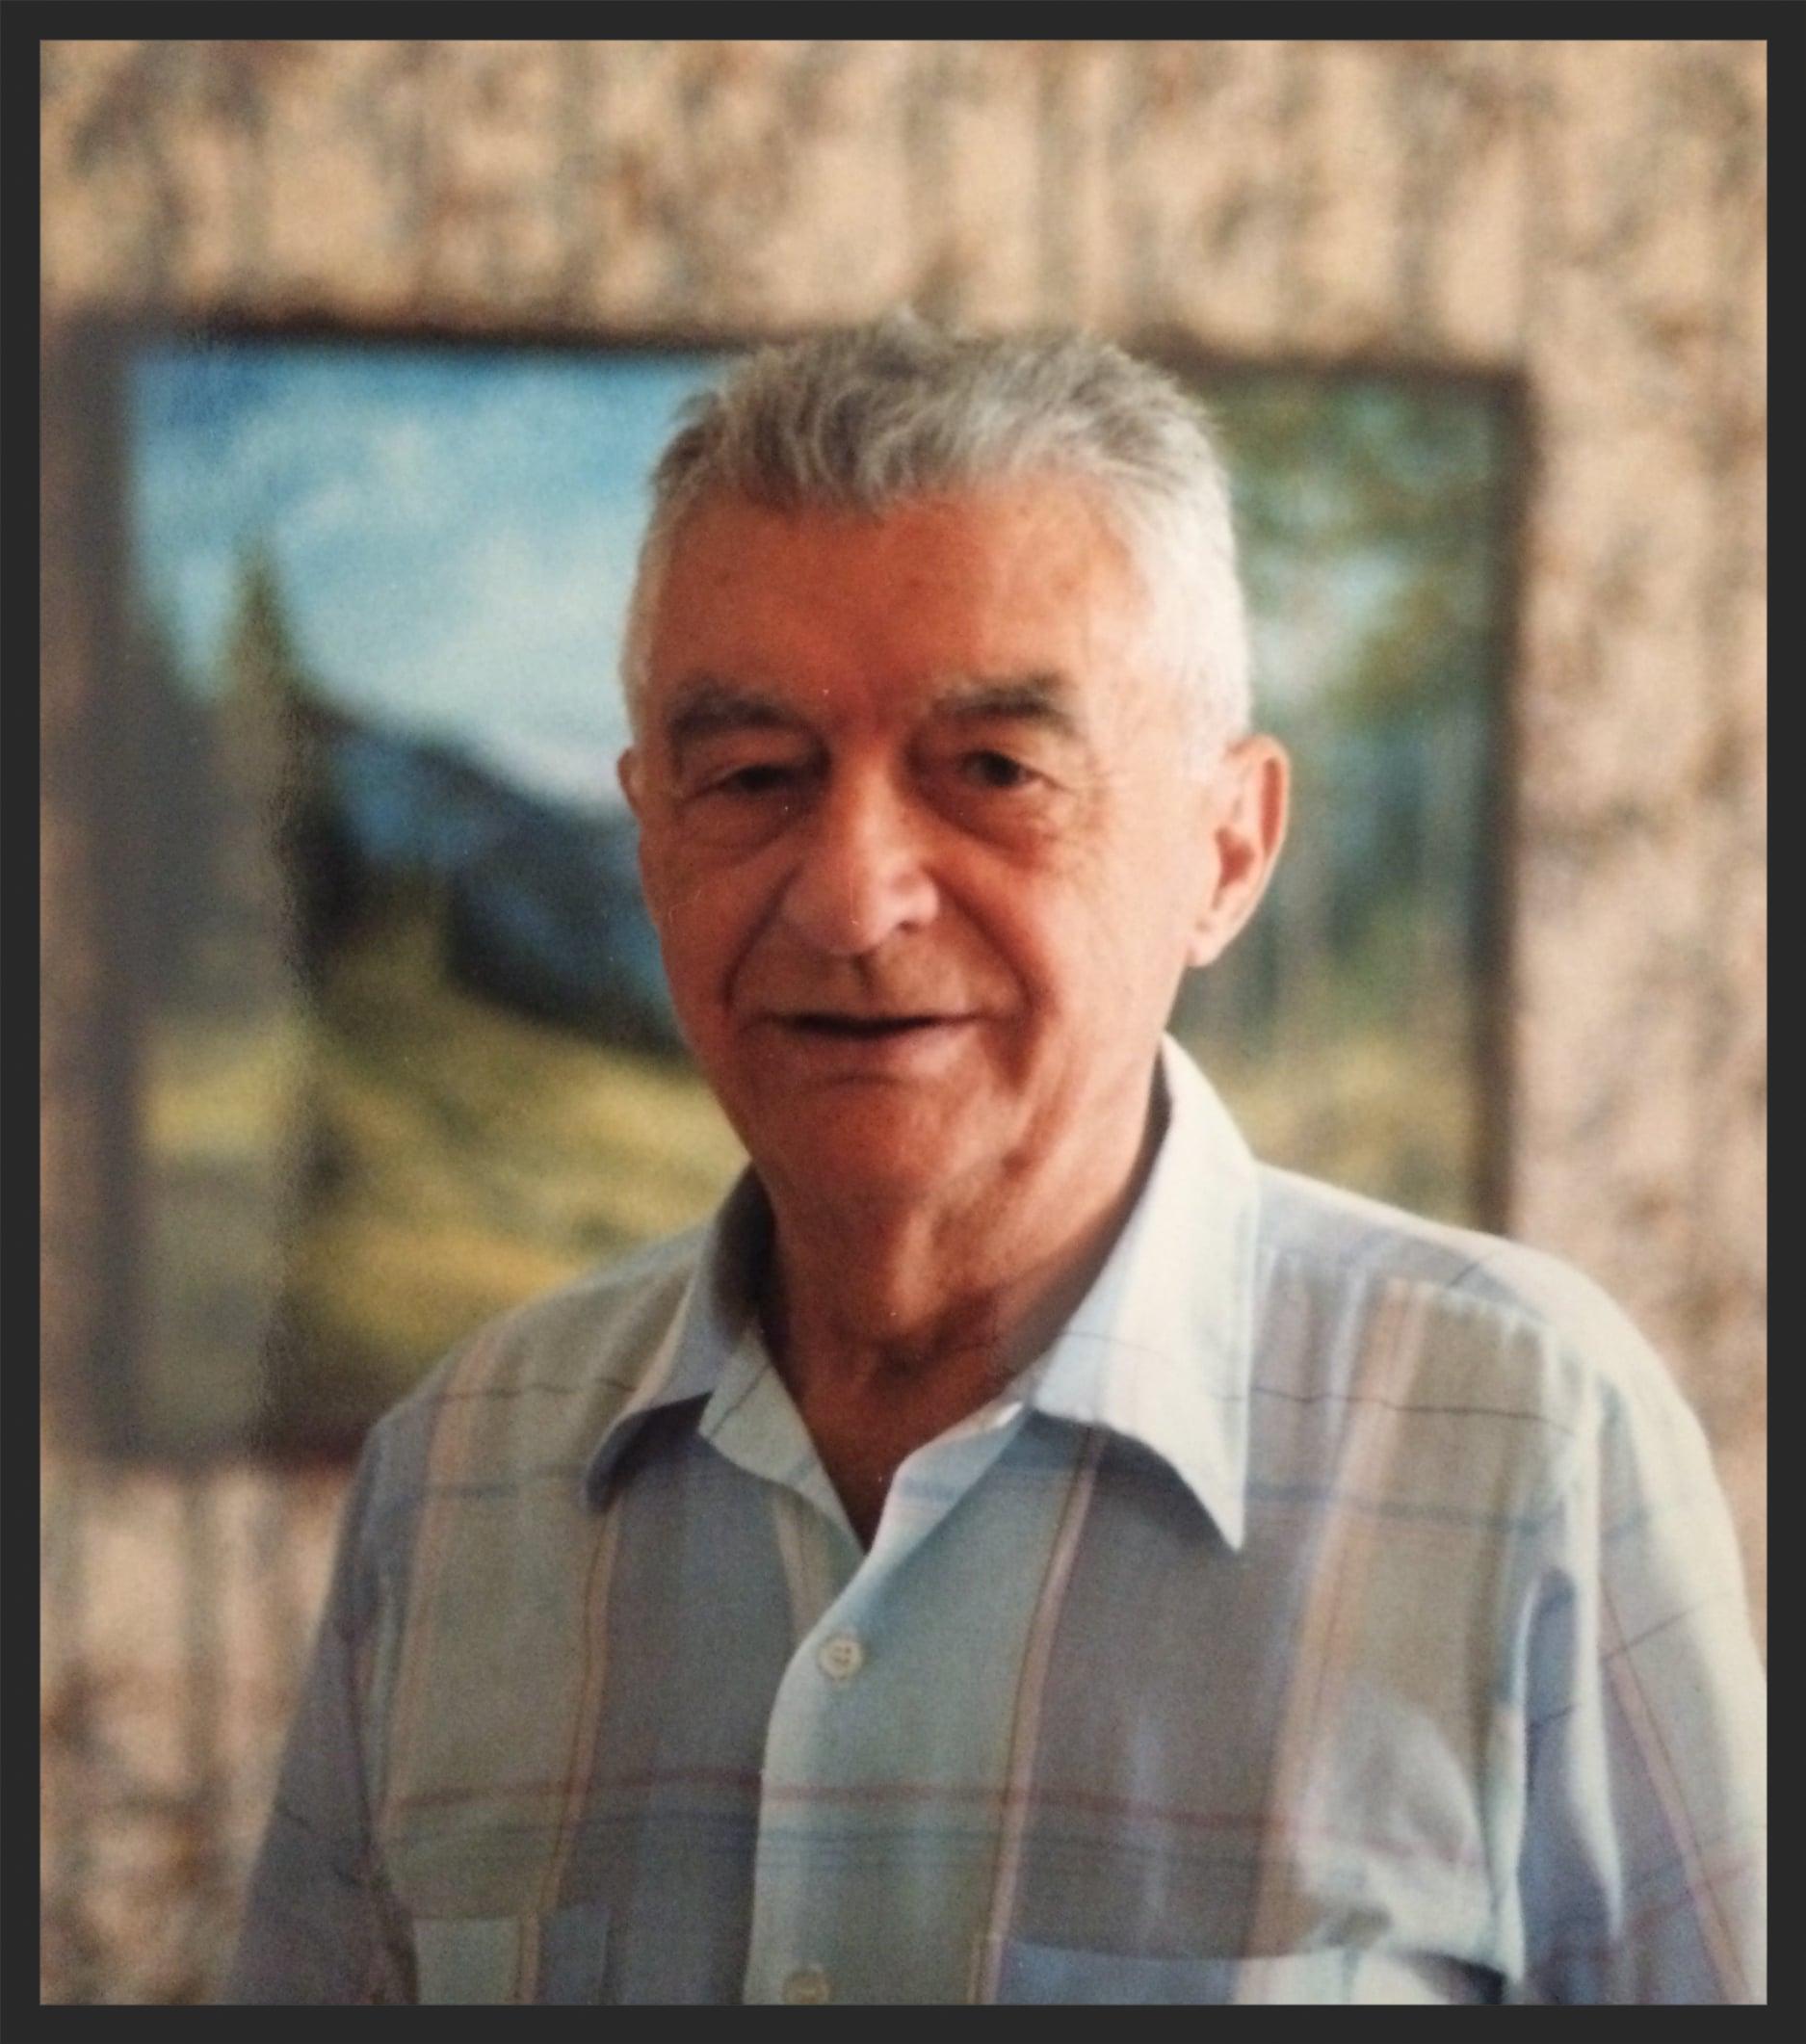 Laszlo Czapary (1916-2004)